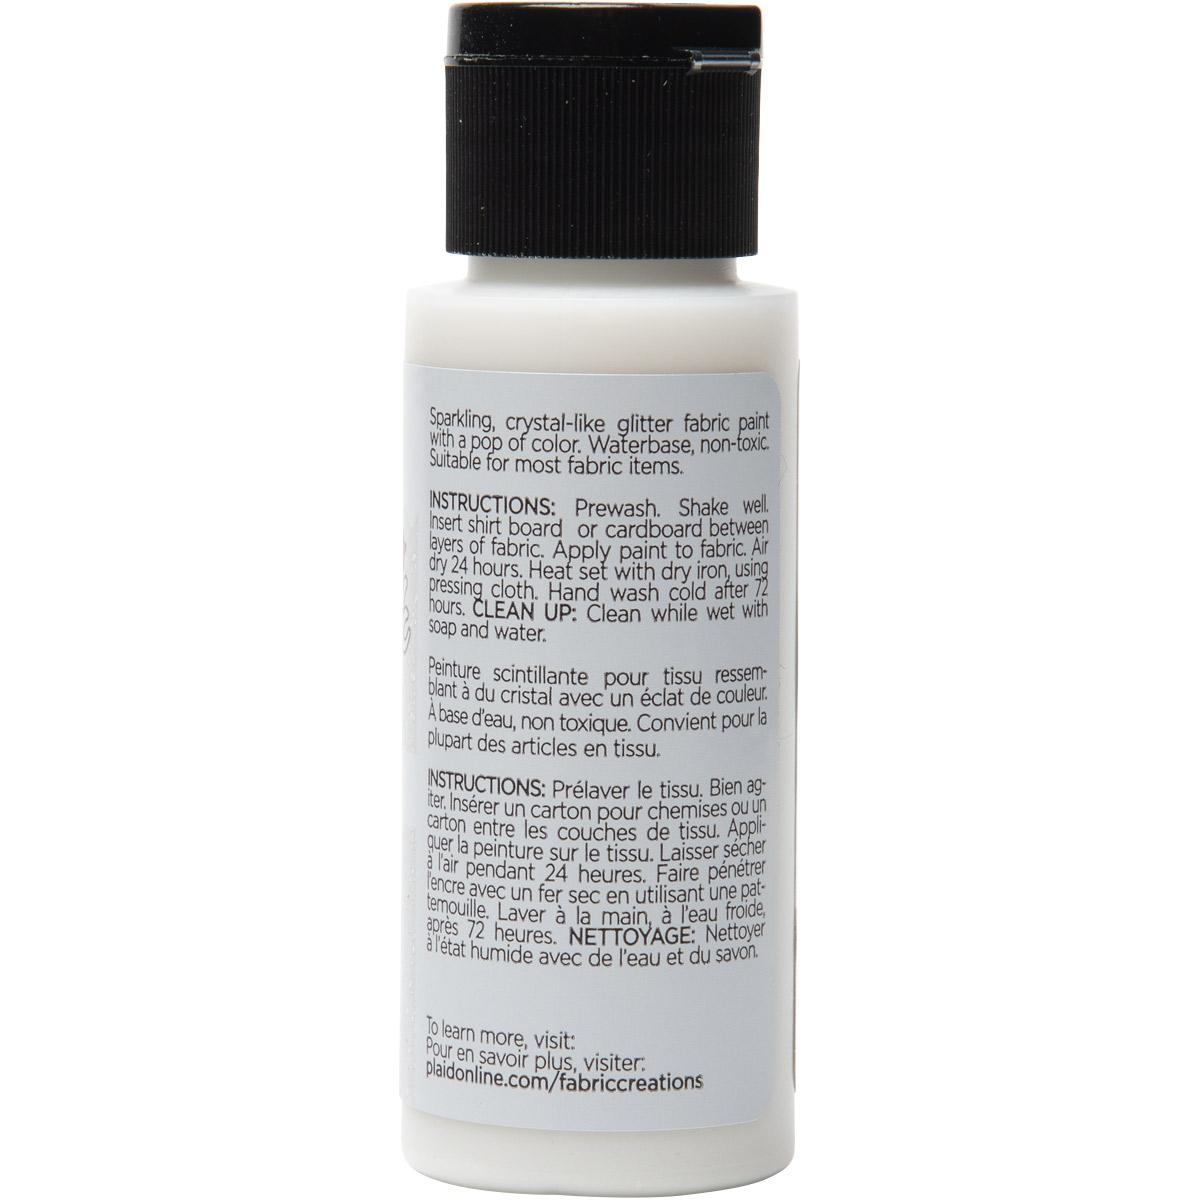 Fabric Creations™ StarStruck Glitter™ Fabric Paint - Crystal, 2 oz.